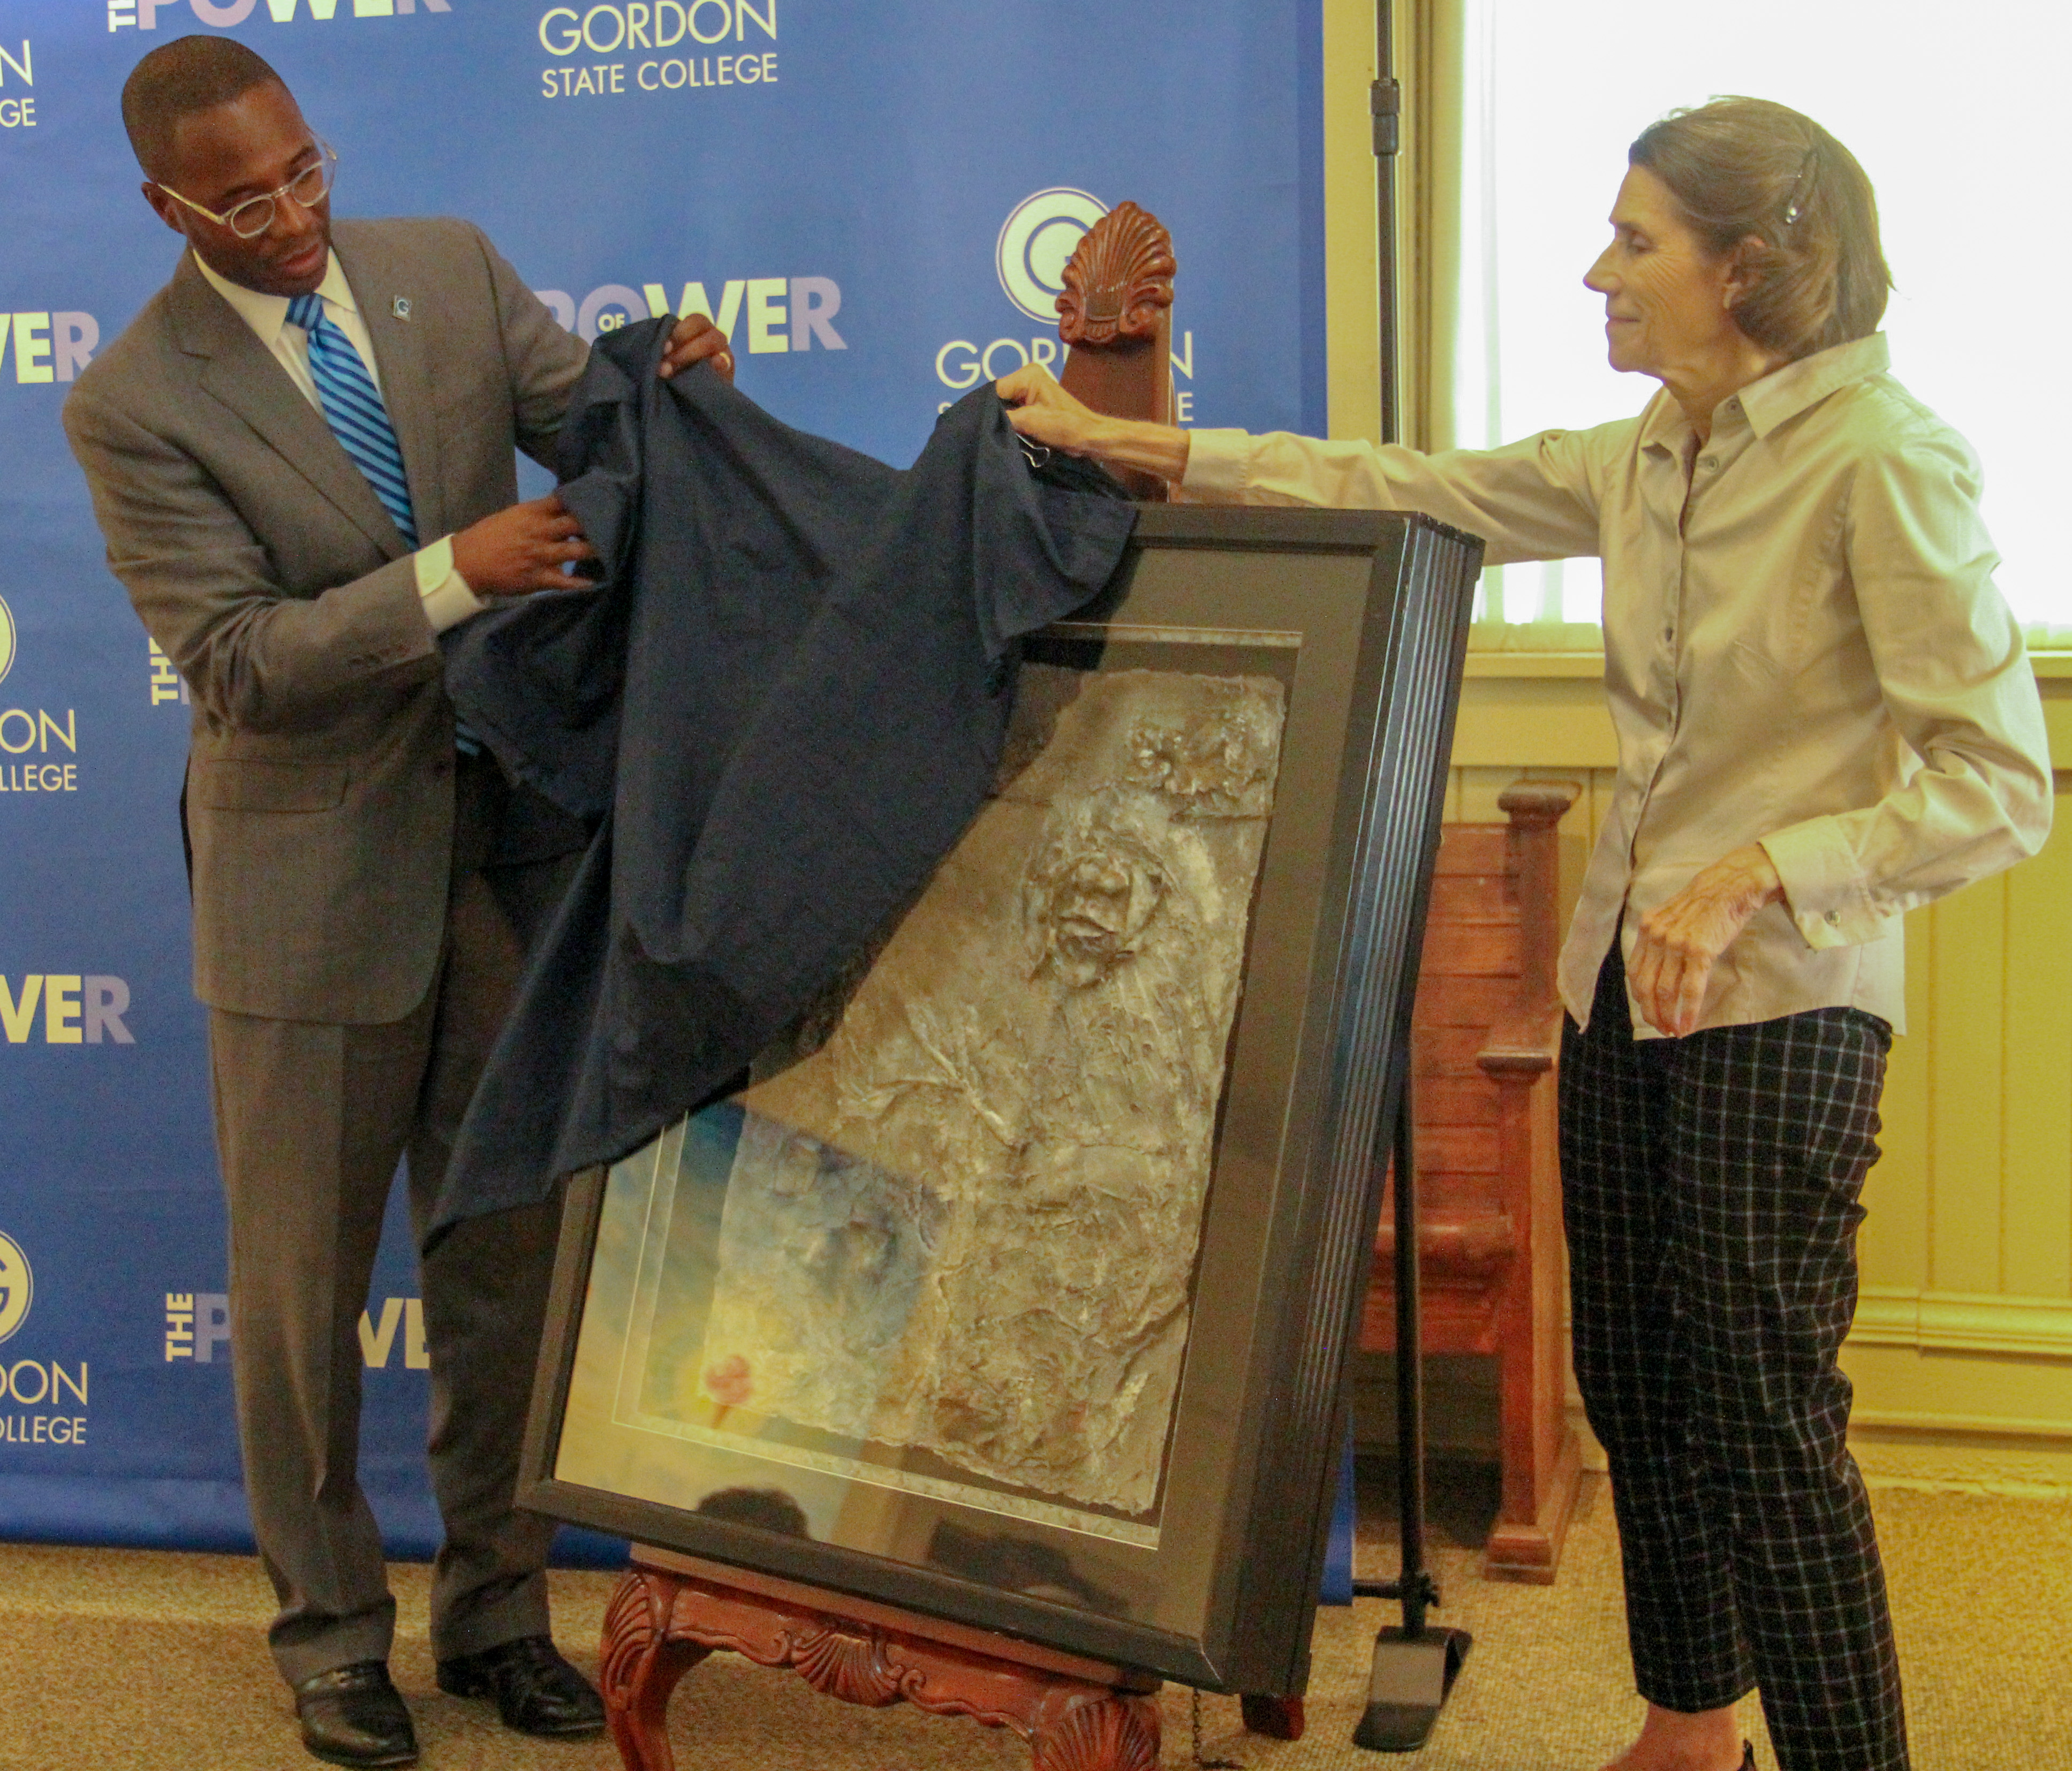 Gordon State College President Kirk A. Nooks and Lamar Arts Depot Gallery Director Angela Preston unveil Virginia Cherry Legge's work.